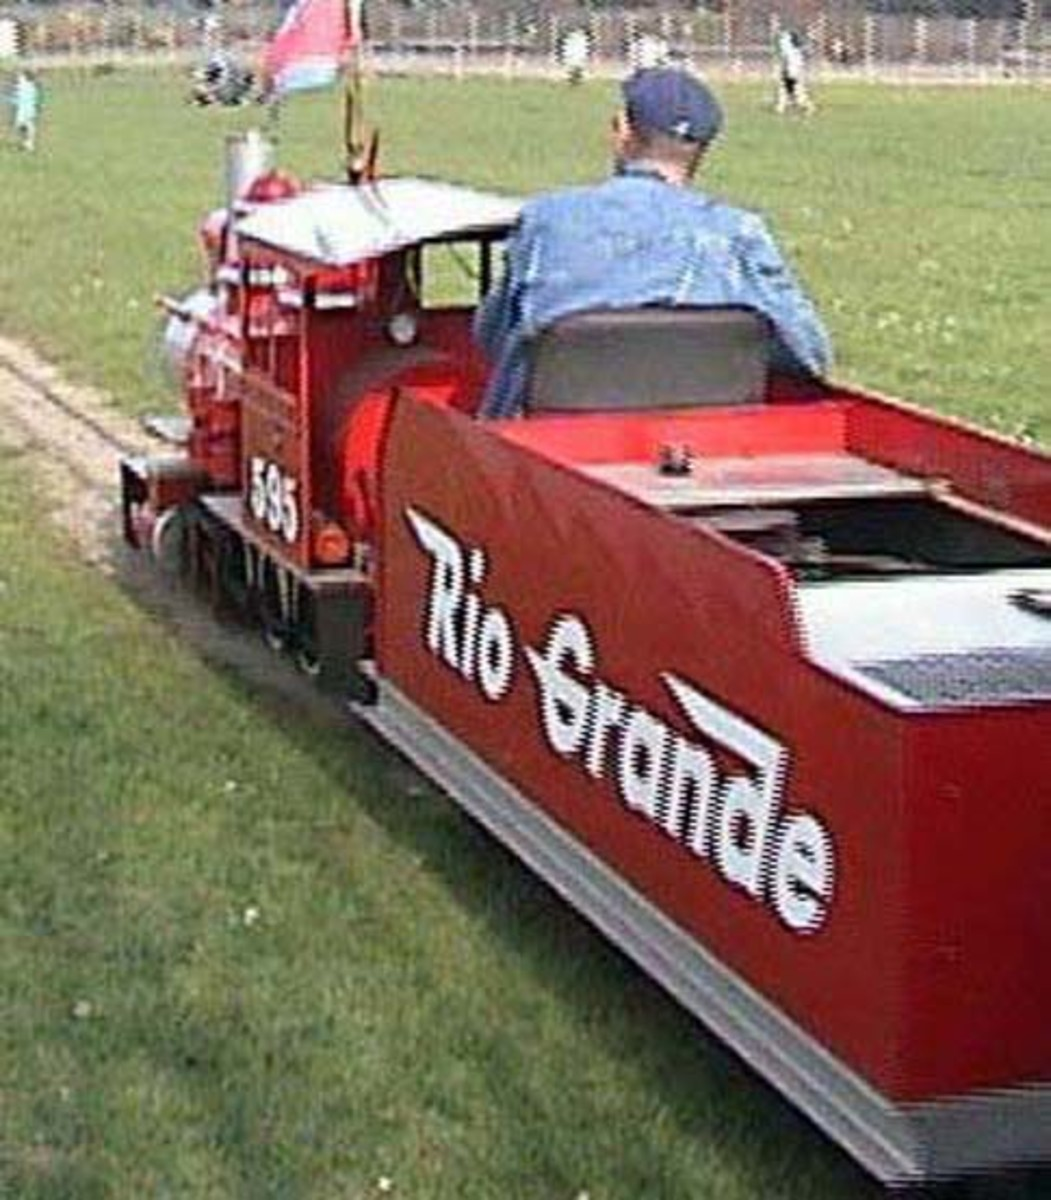 Clevedon miniature railway, near Bristol